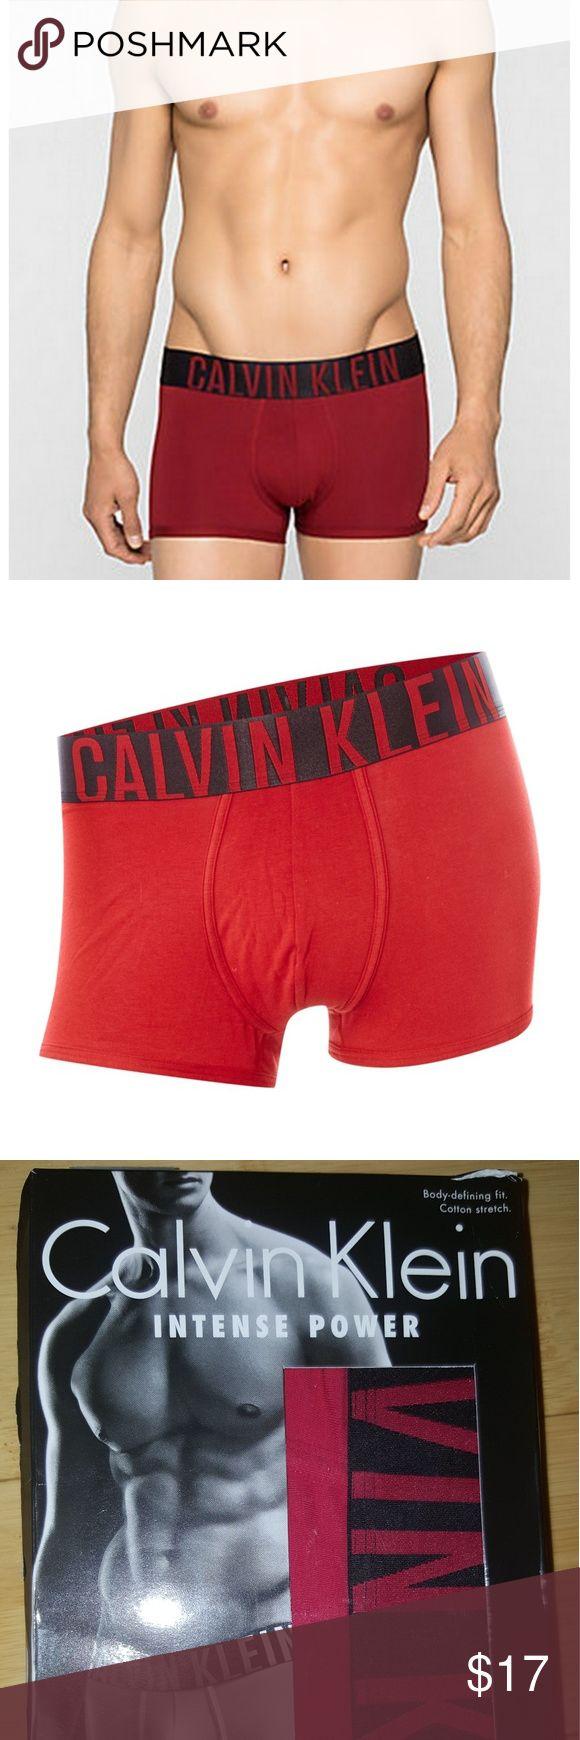 Calvin Klein INTENSE POWER Trunk Red Size Large Brand New Calvin Klein Men Trunk for sale half off Retail $30  Color: Red Size: Large Calvin Klein Underwear & Socks Boxer Briefs